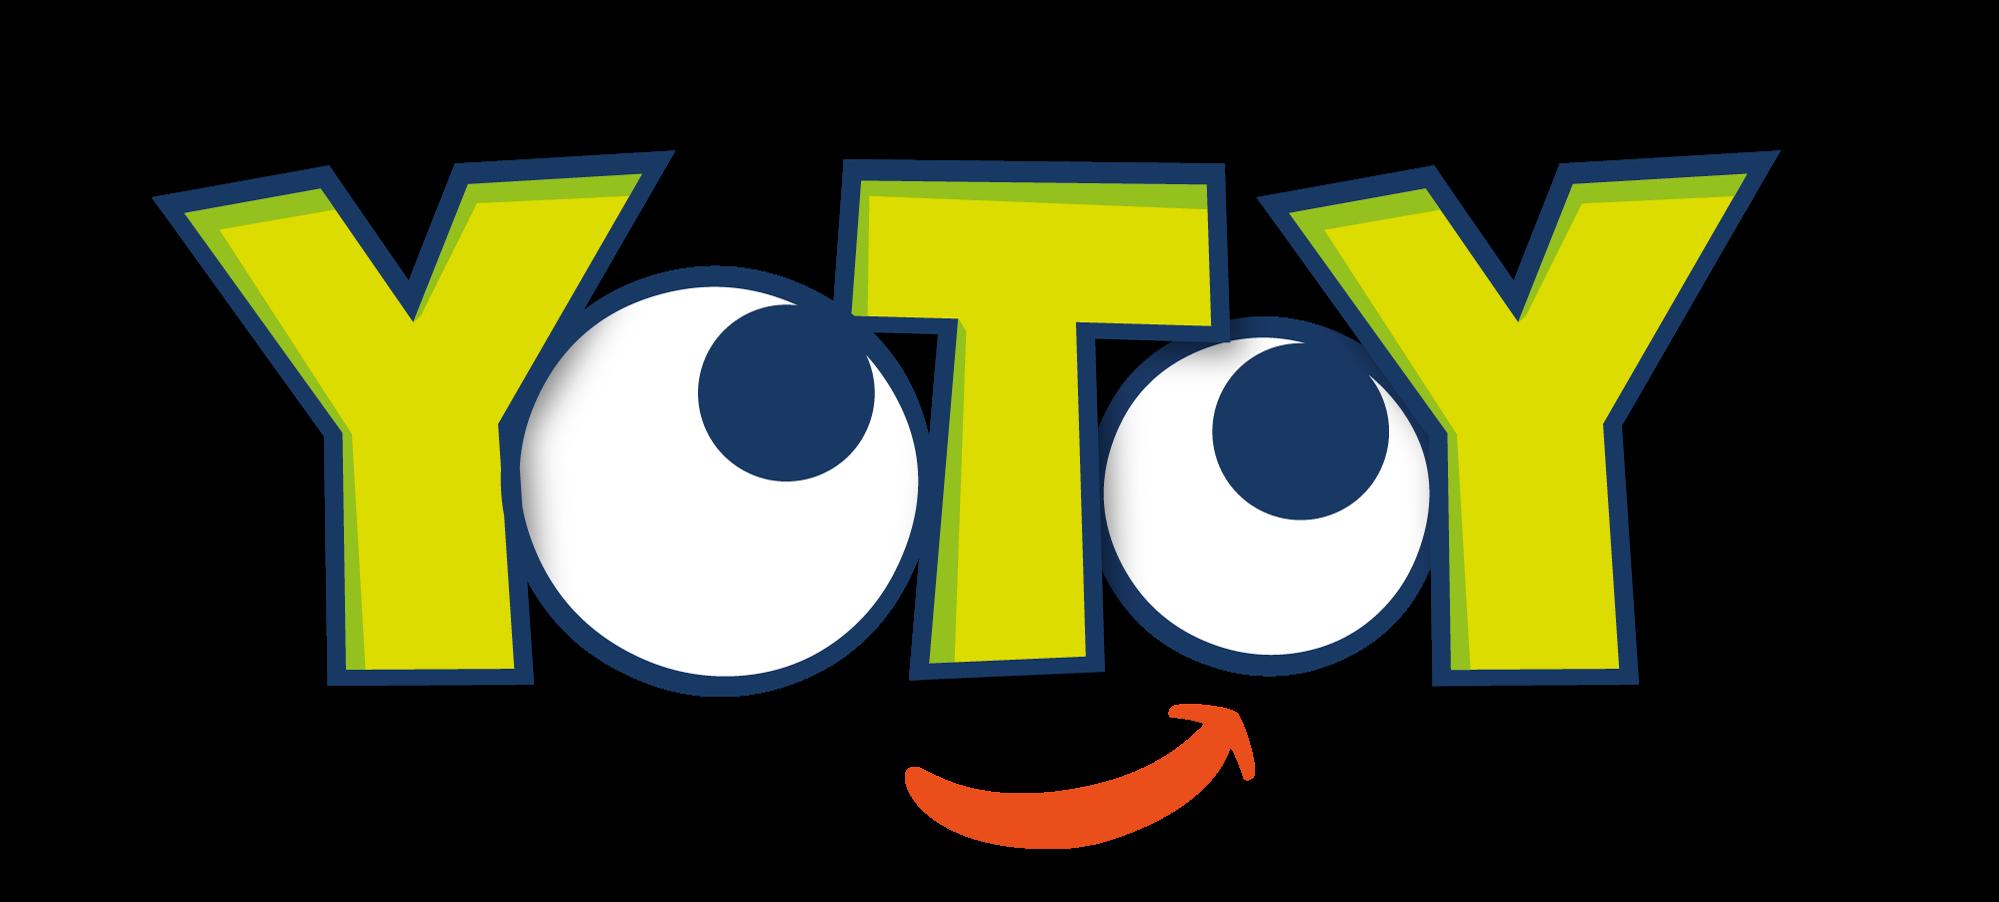 YoToy